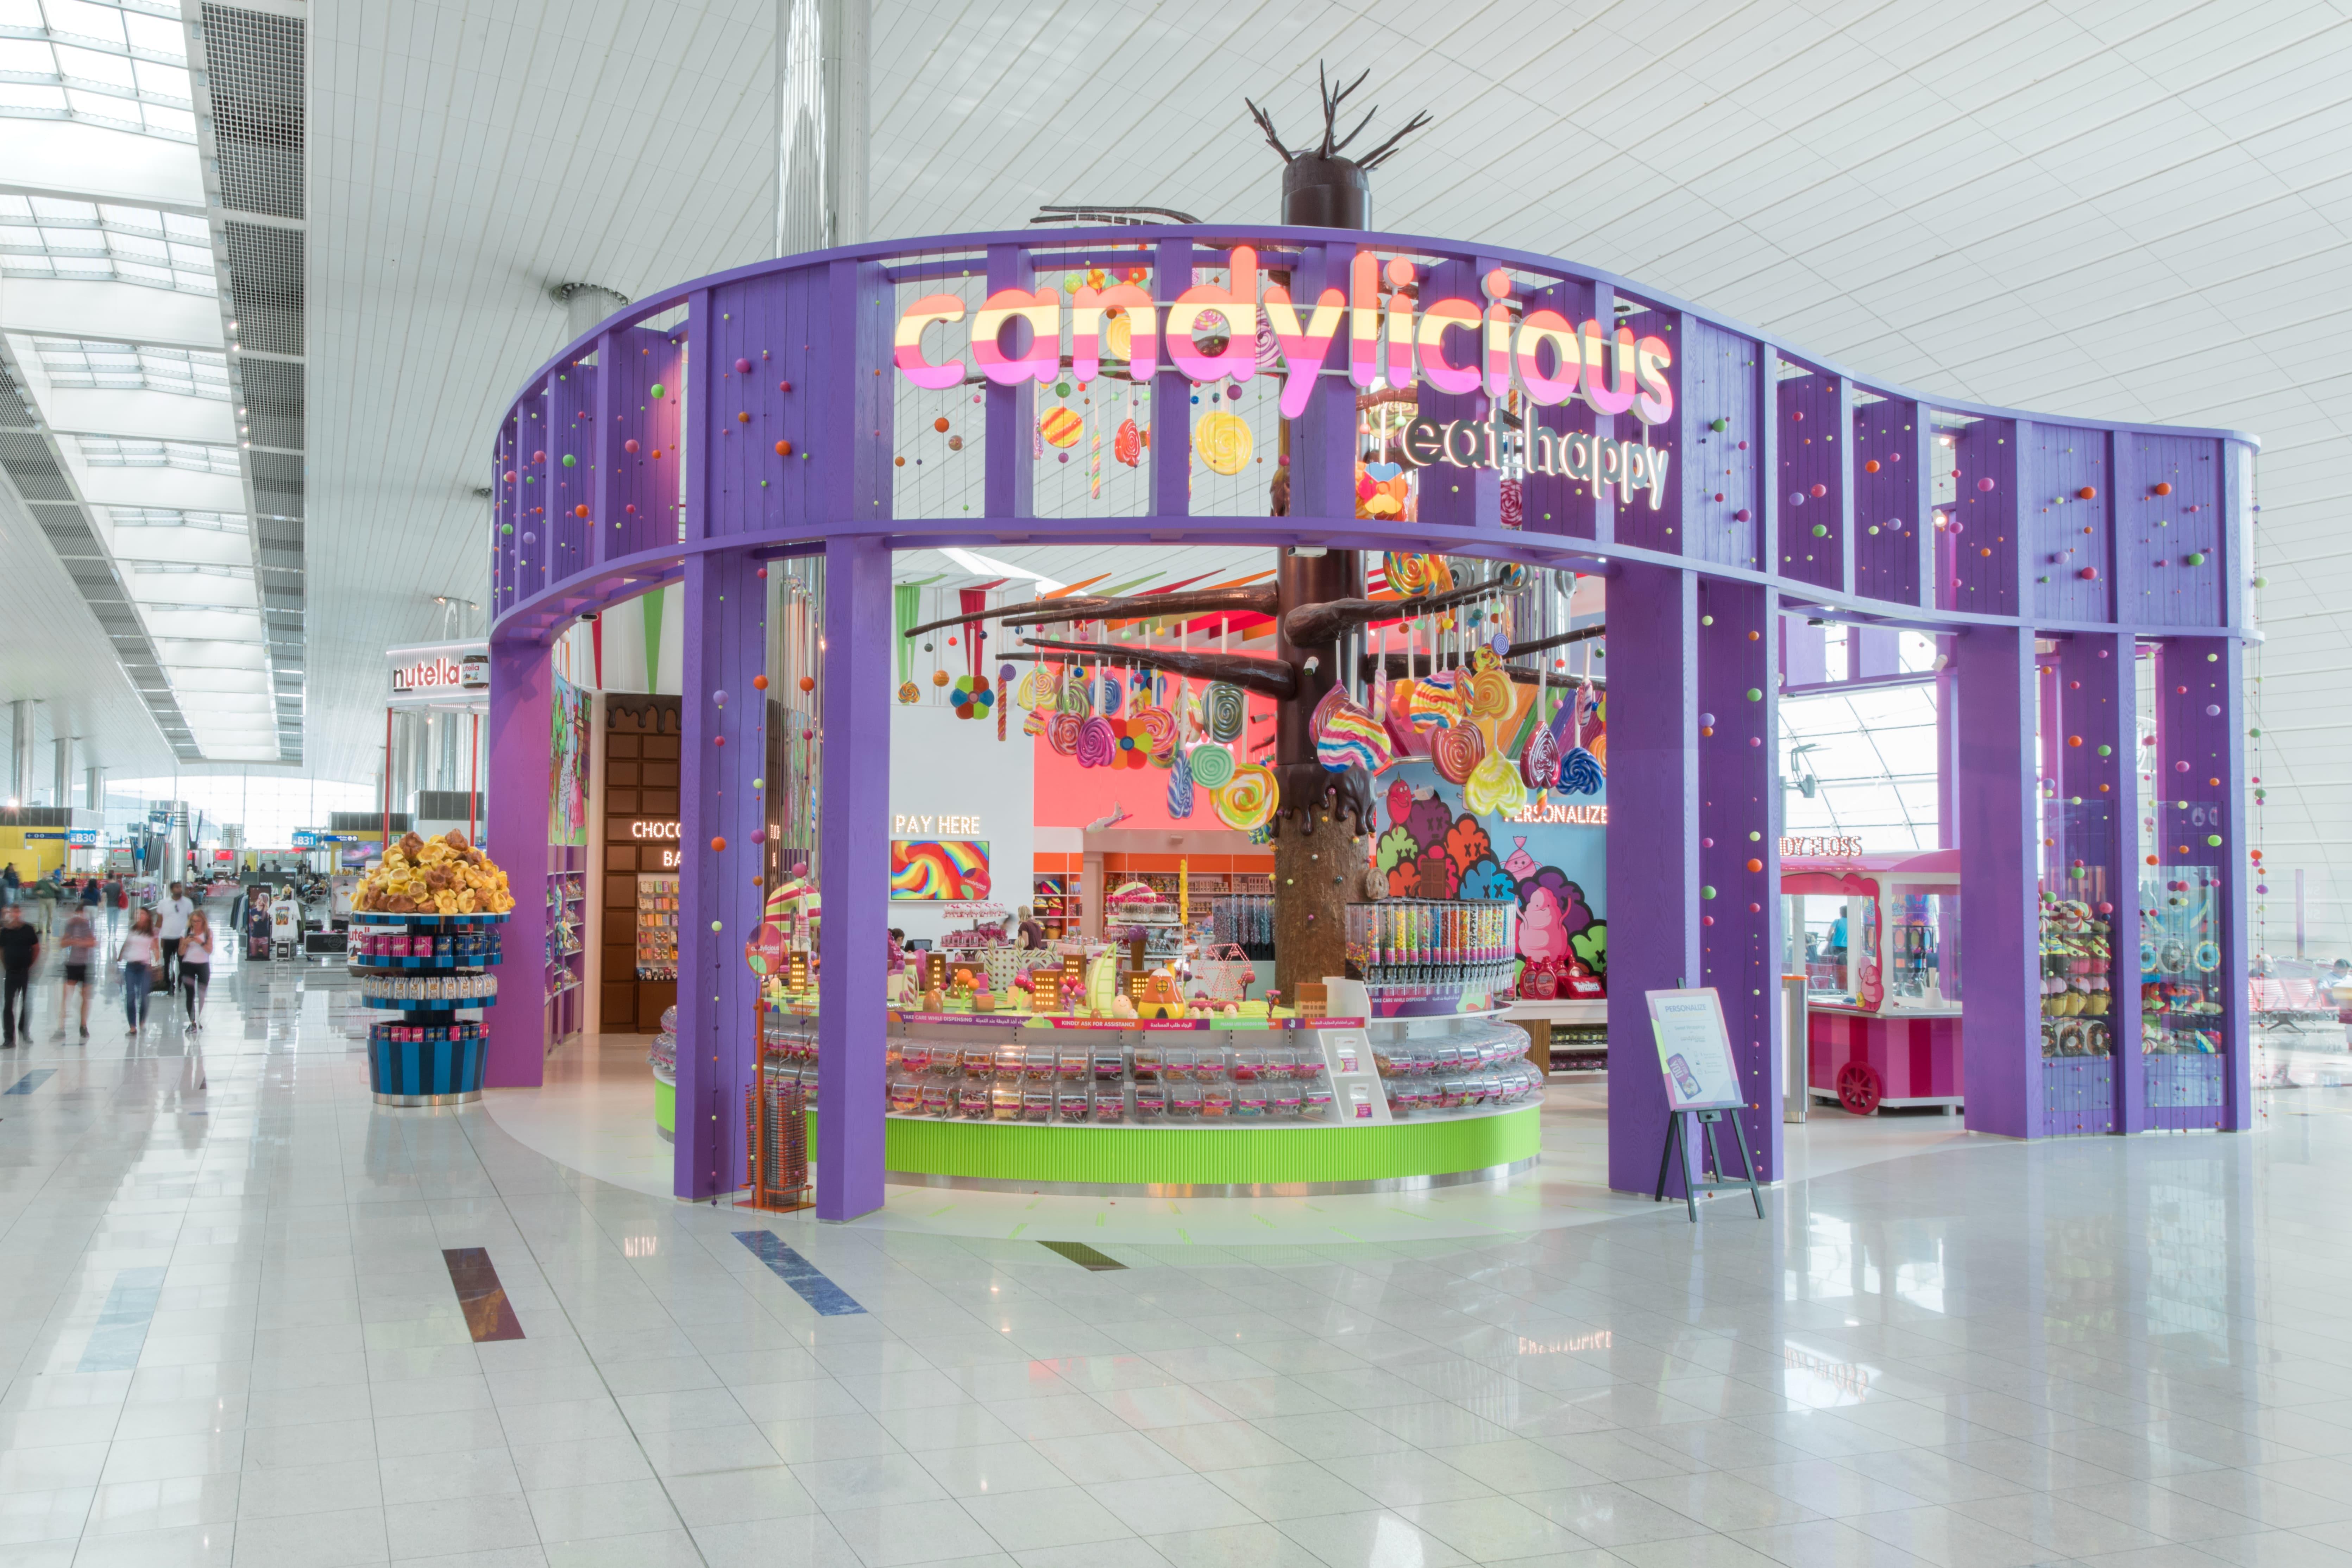 H2RDesign_CandyliciousDubaiAirport_IMG00-min